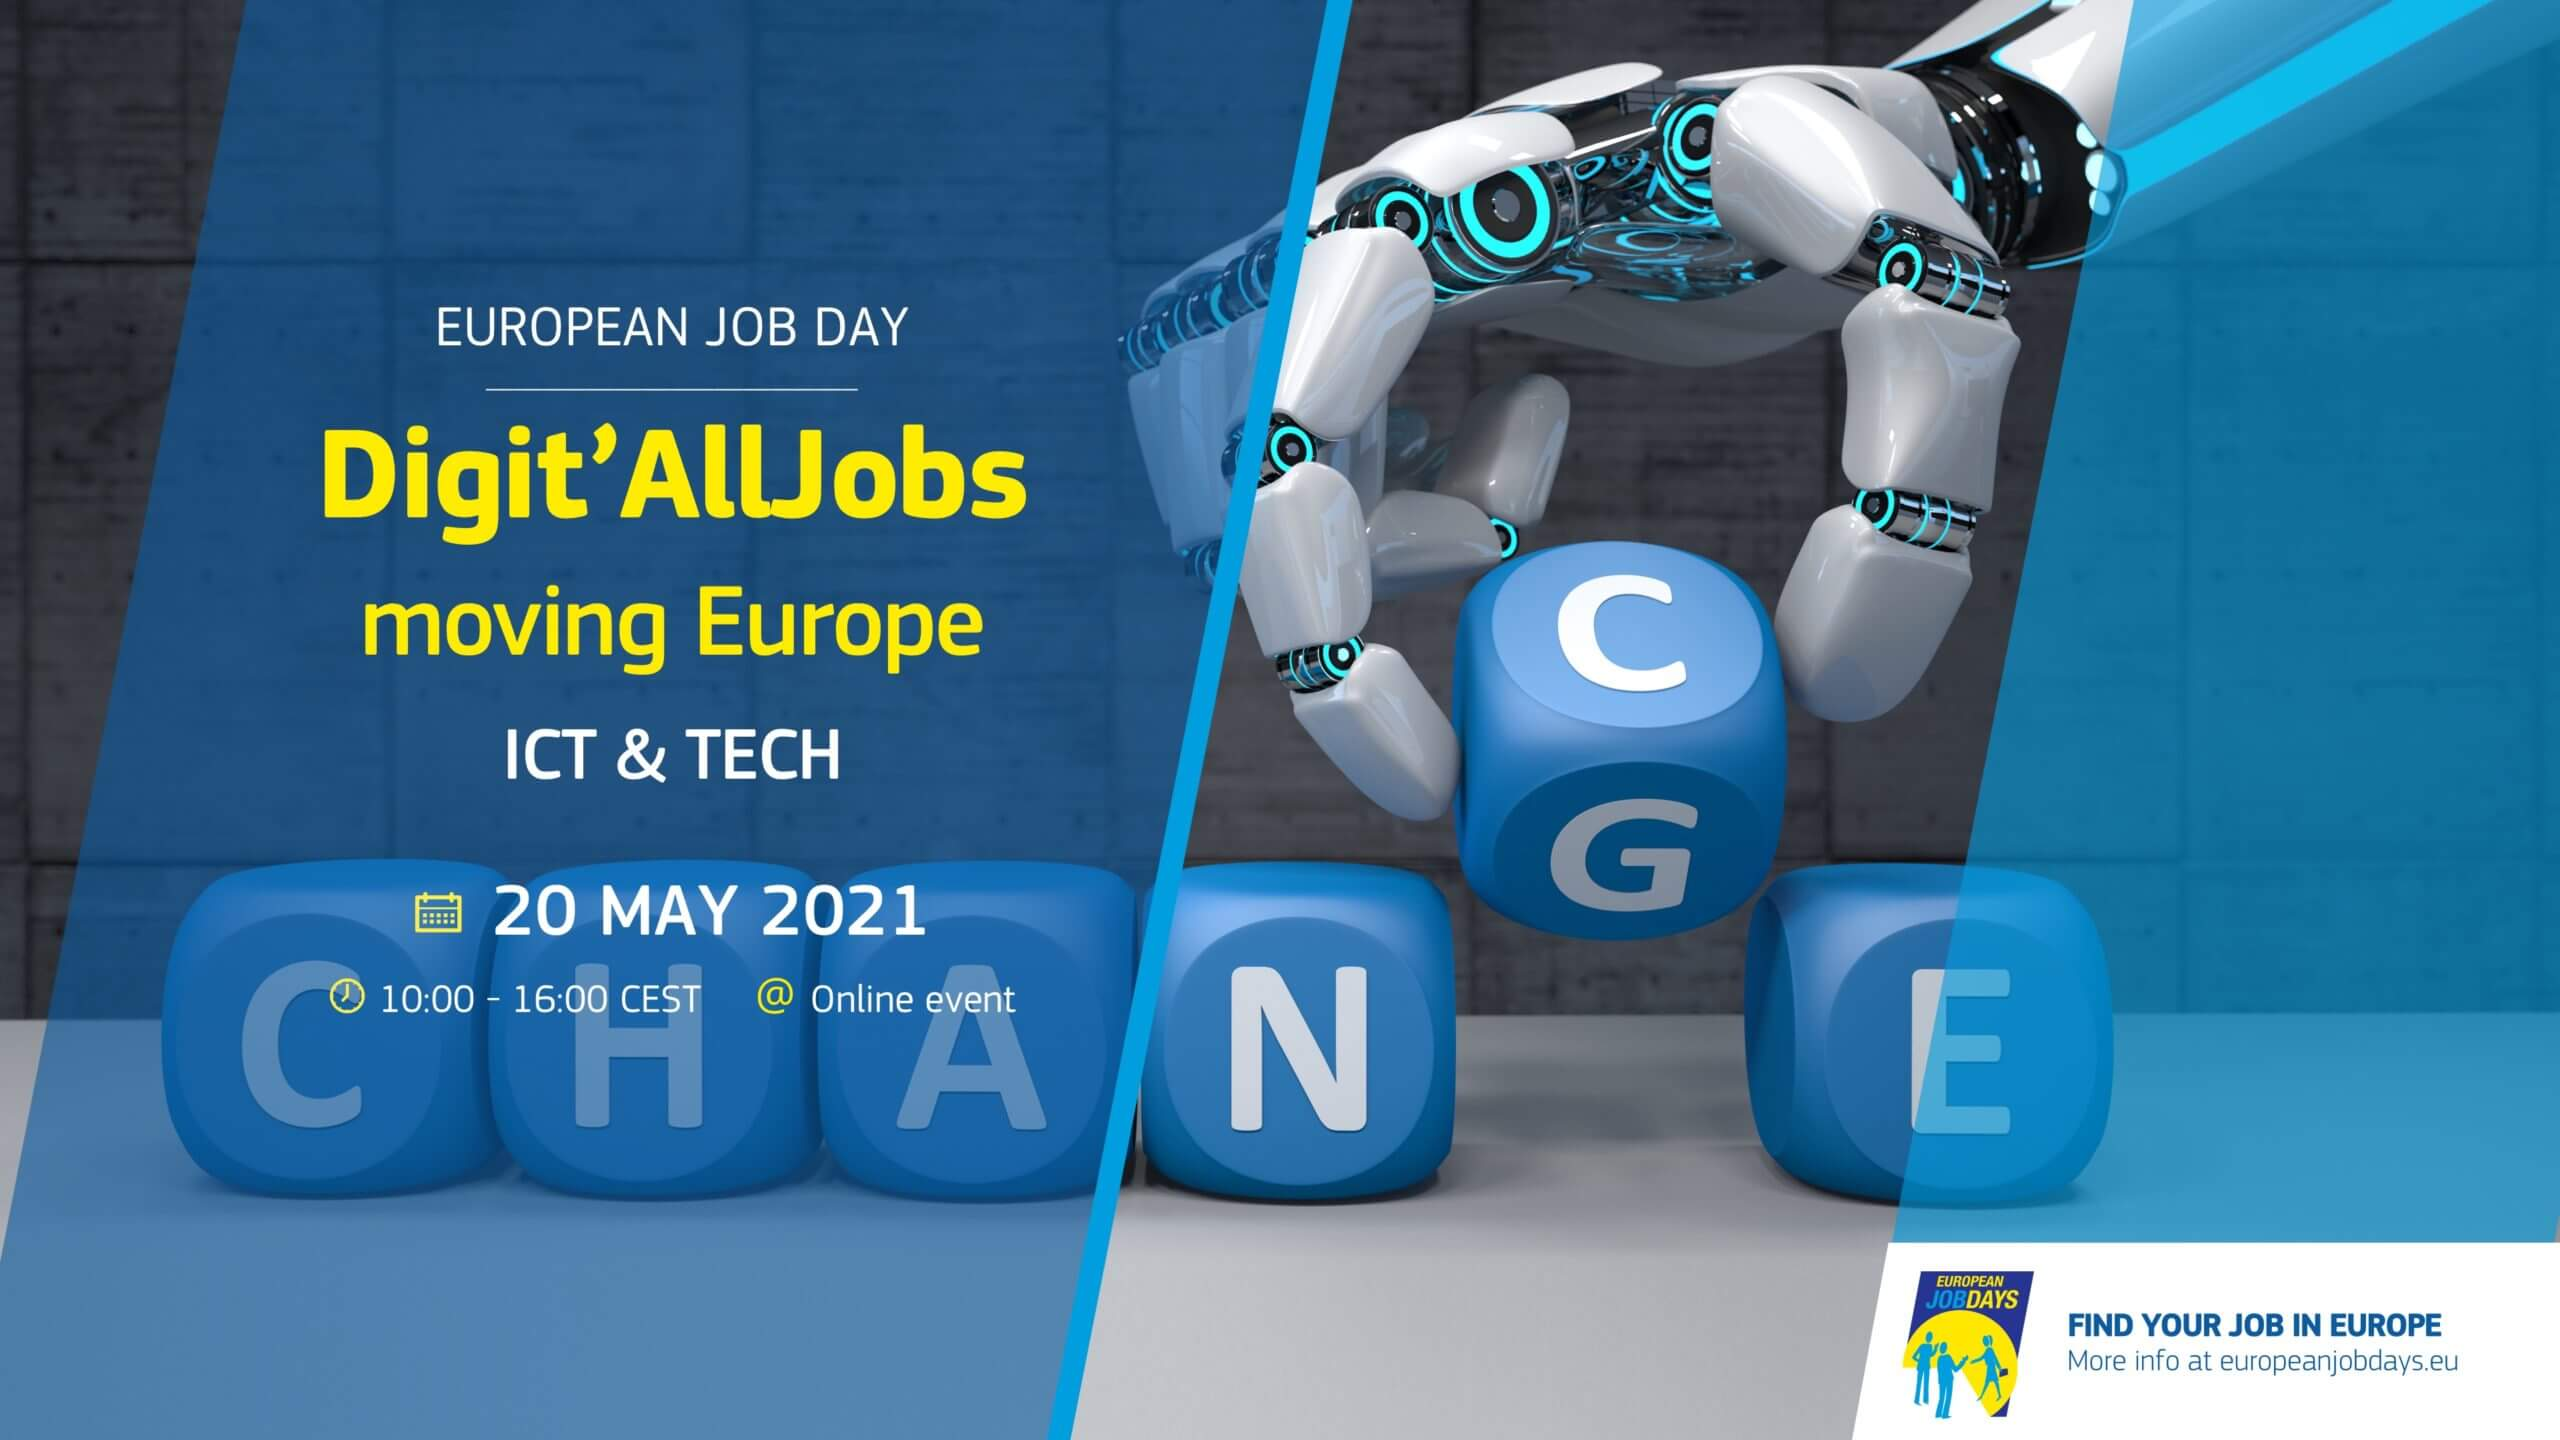 Digital'all Jobs - 20 may 2021